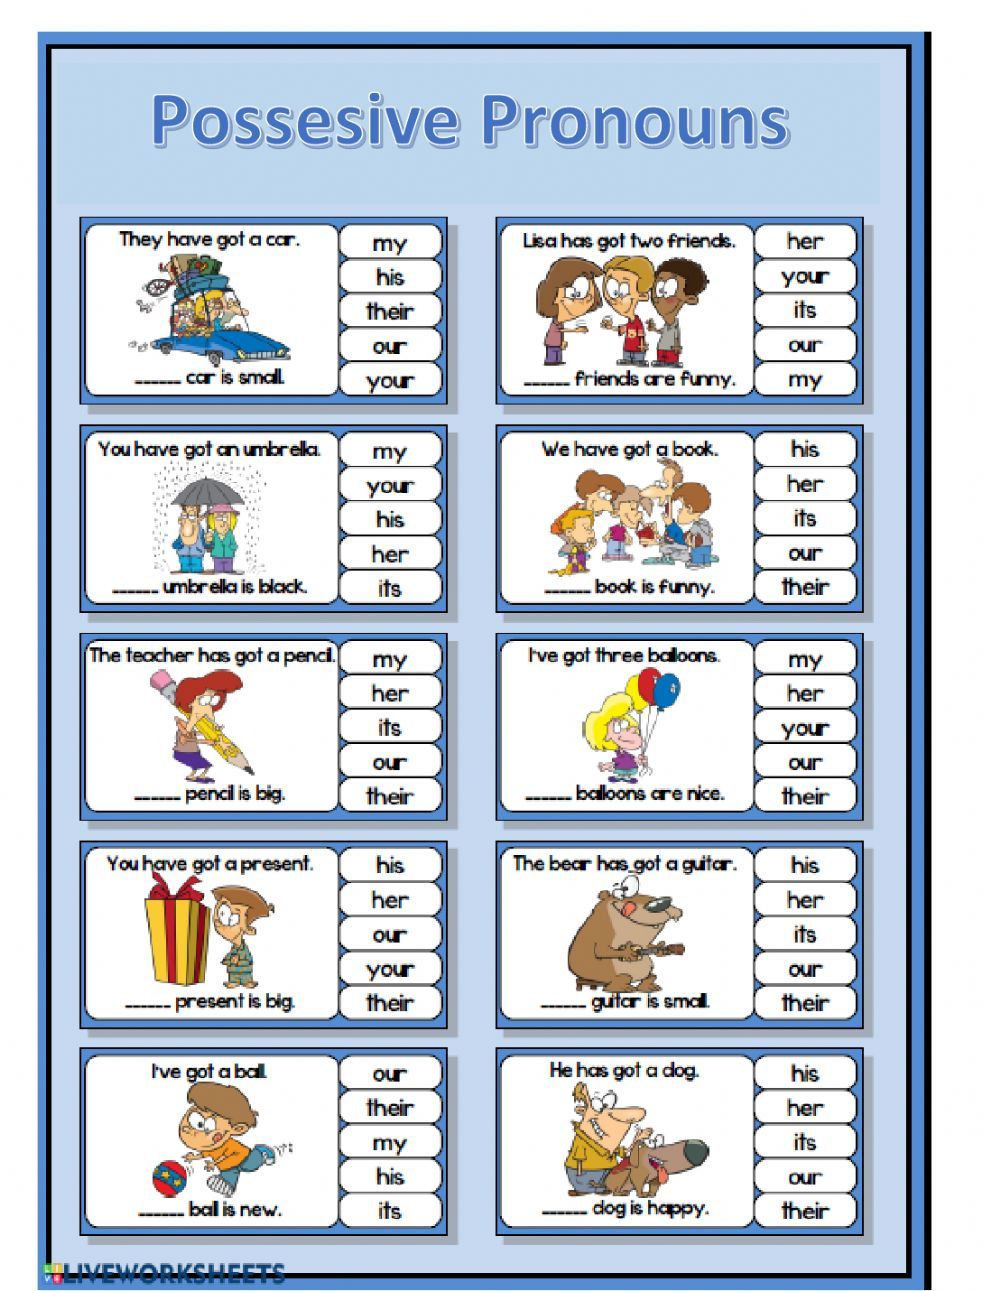 Possessive Pronouns Online Pdf Worksheet Possessive Pronoun Possessive Pronouns Worksheets Pronoun Activities [ 1291 x 1000 Pixel ]